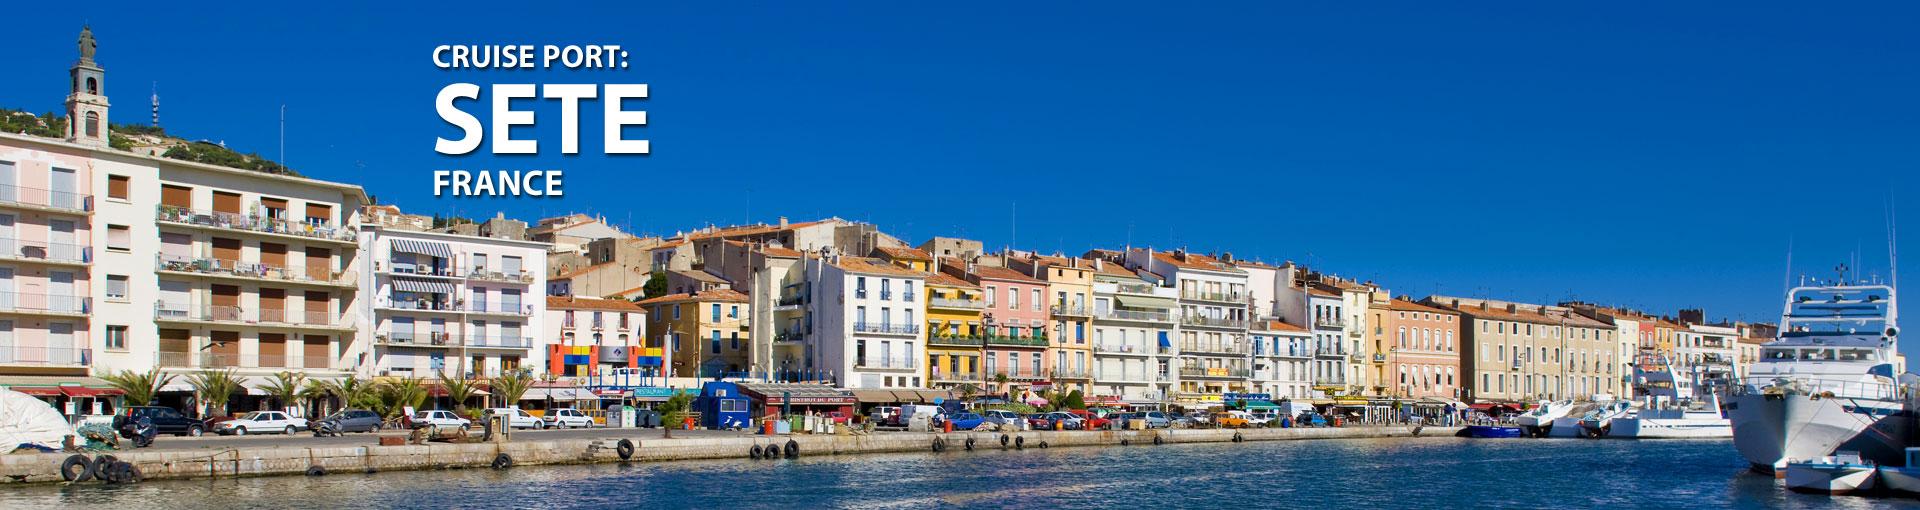 Cruises to Sete, France